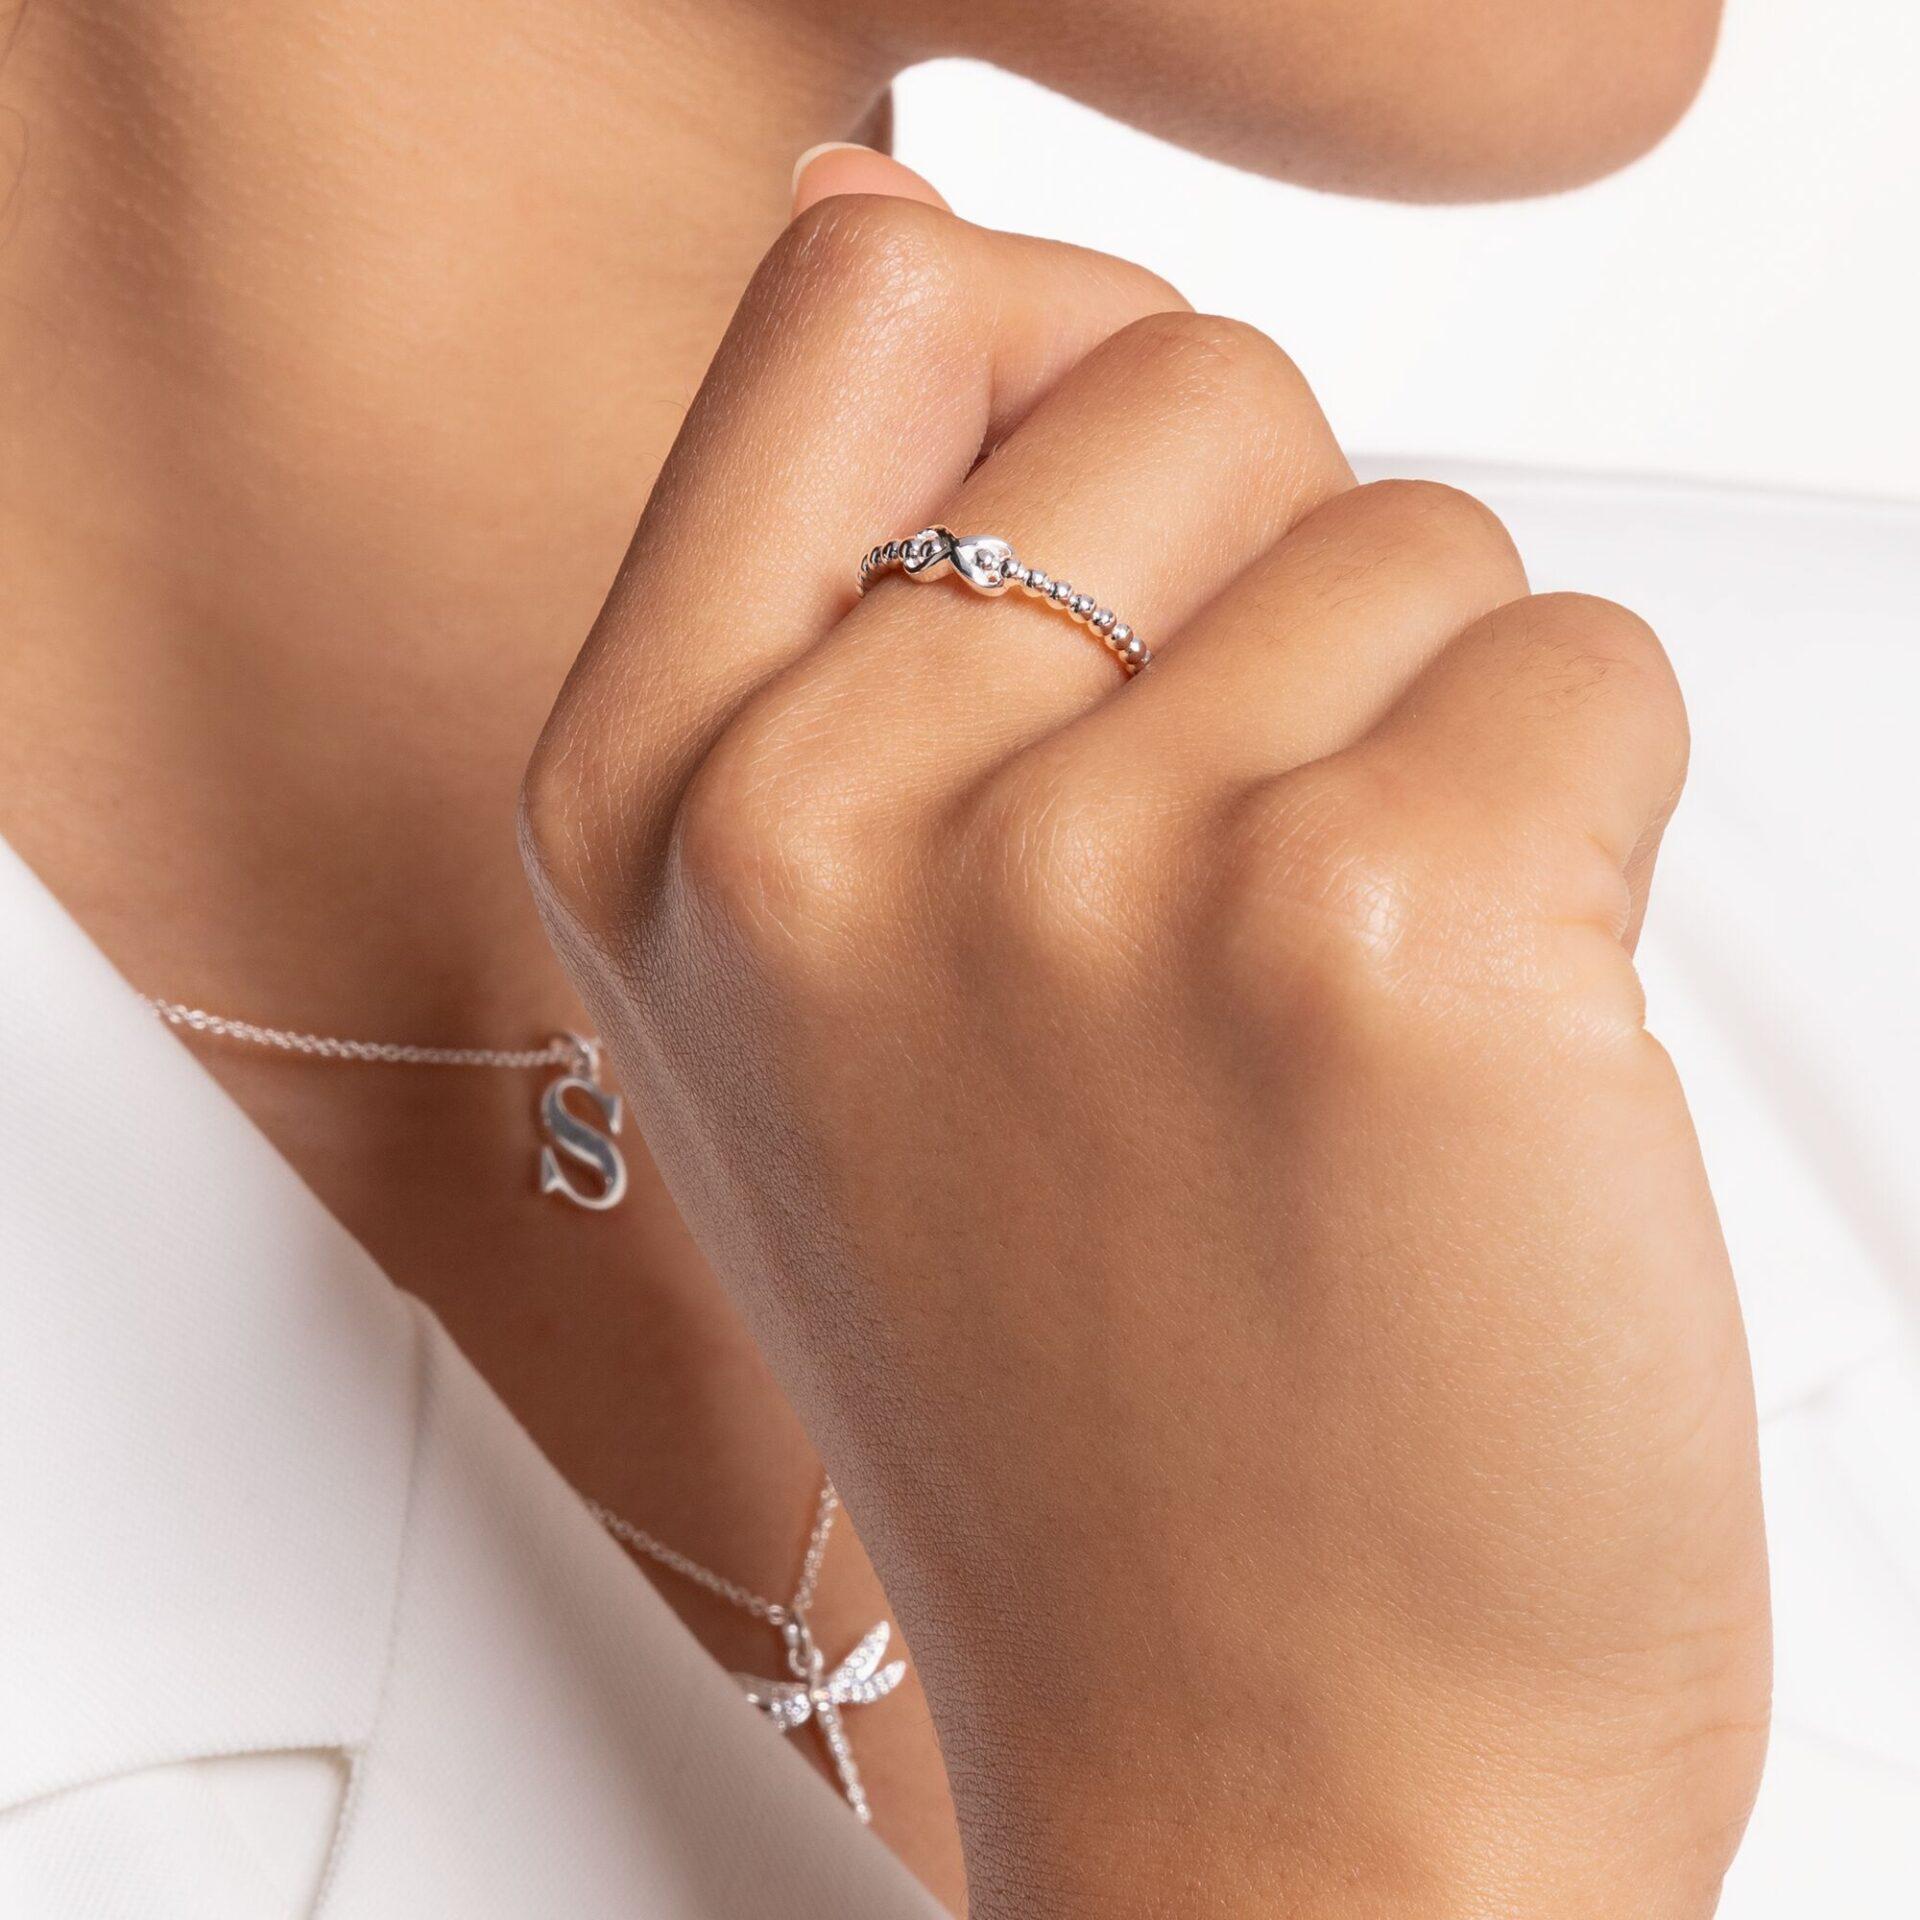 Bague perles avec Infinity argent, Thomas Sabo